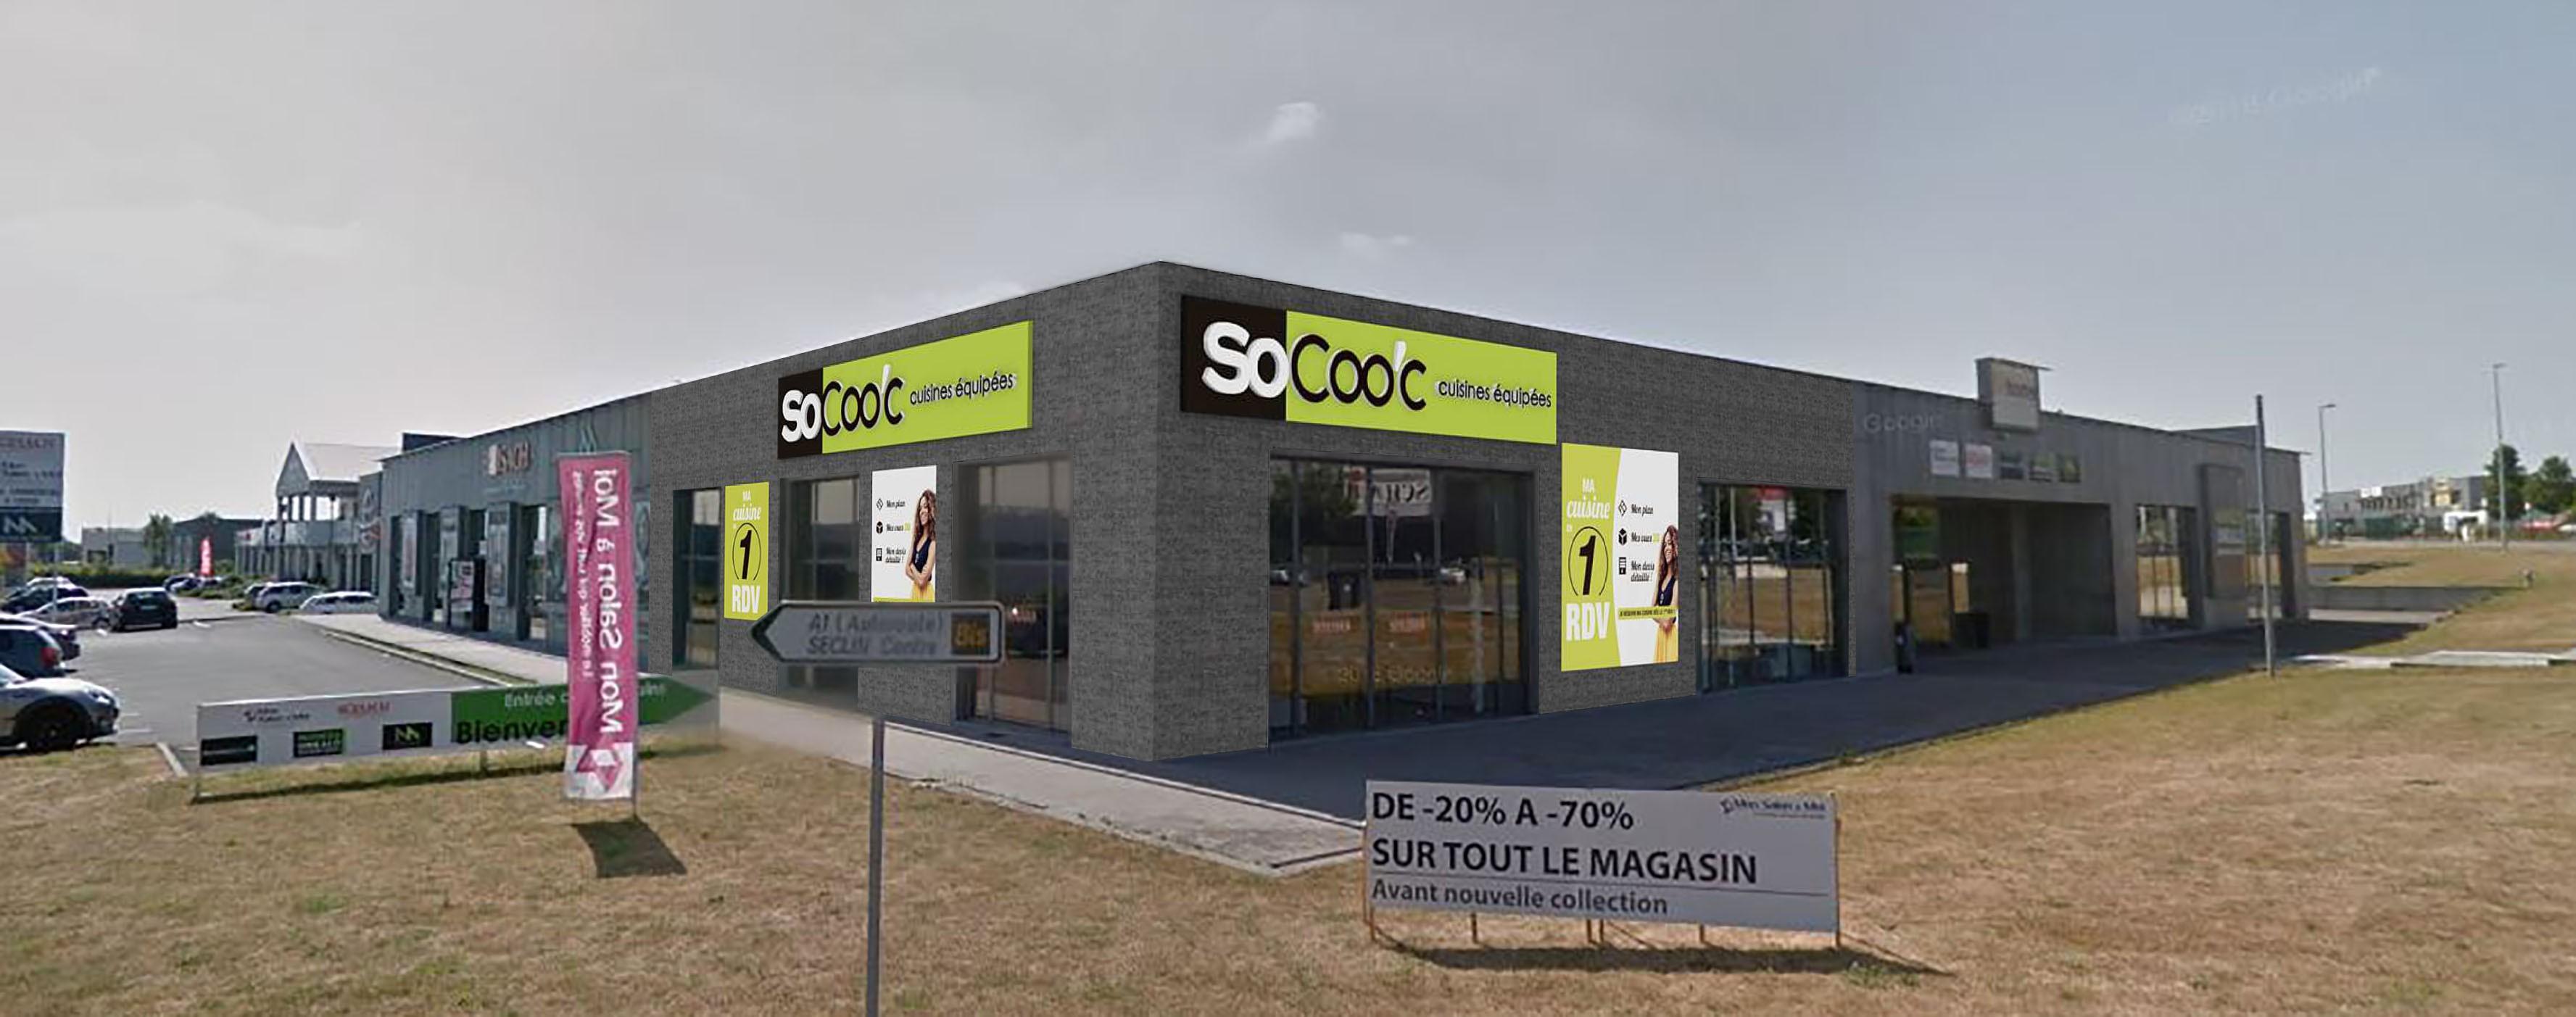 Magasin Socoo C Cuisine socoo'c cuisines seclin | linkedin